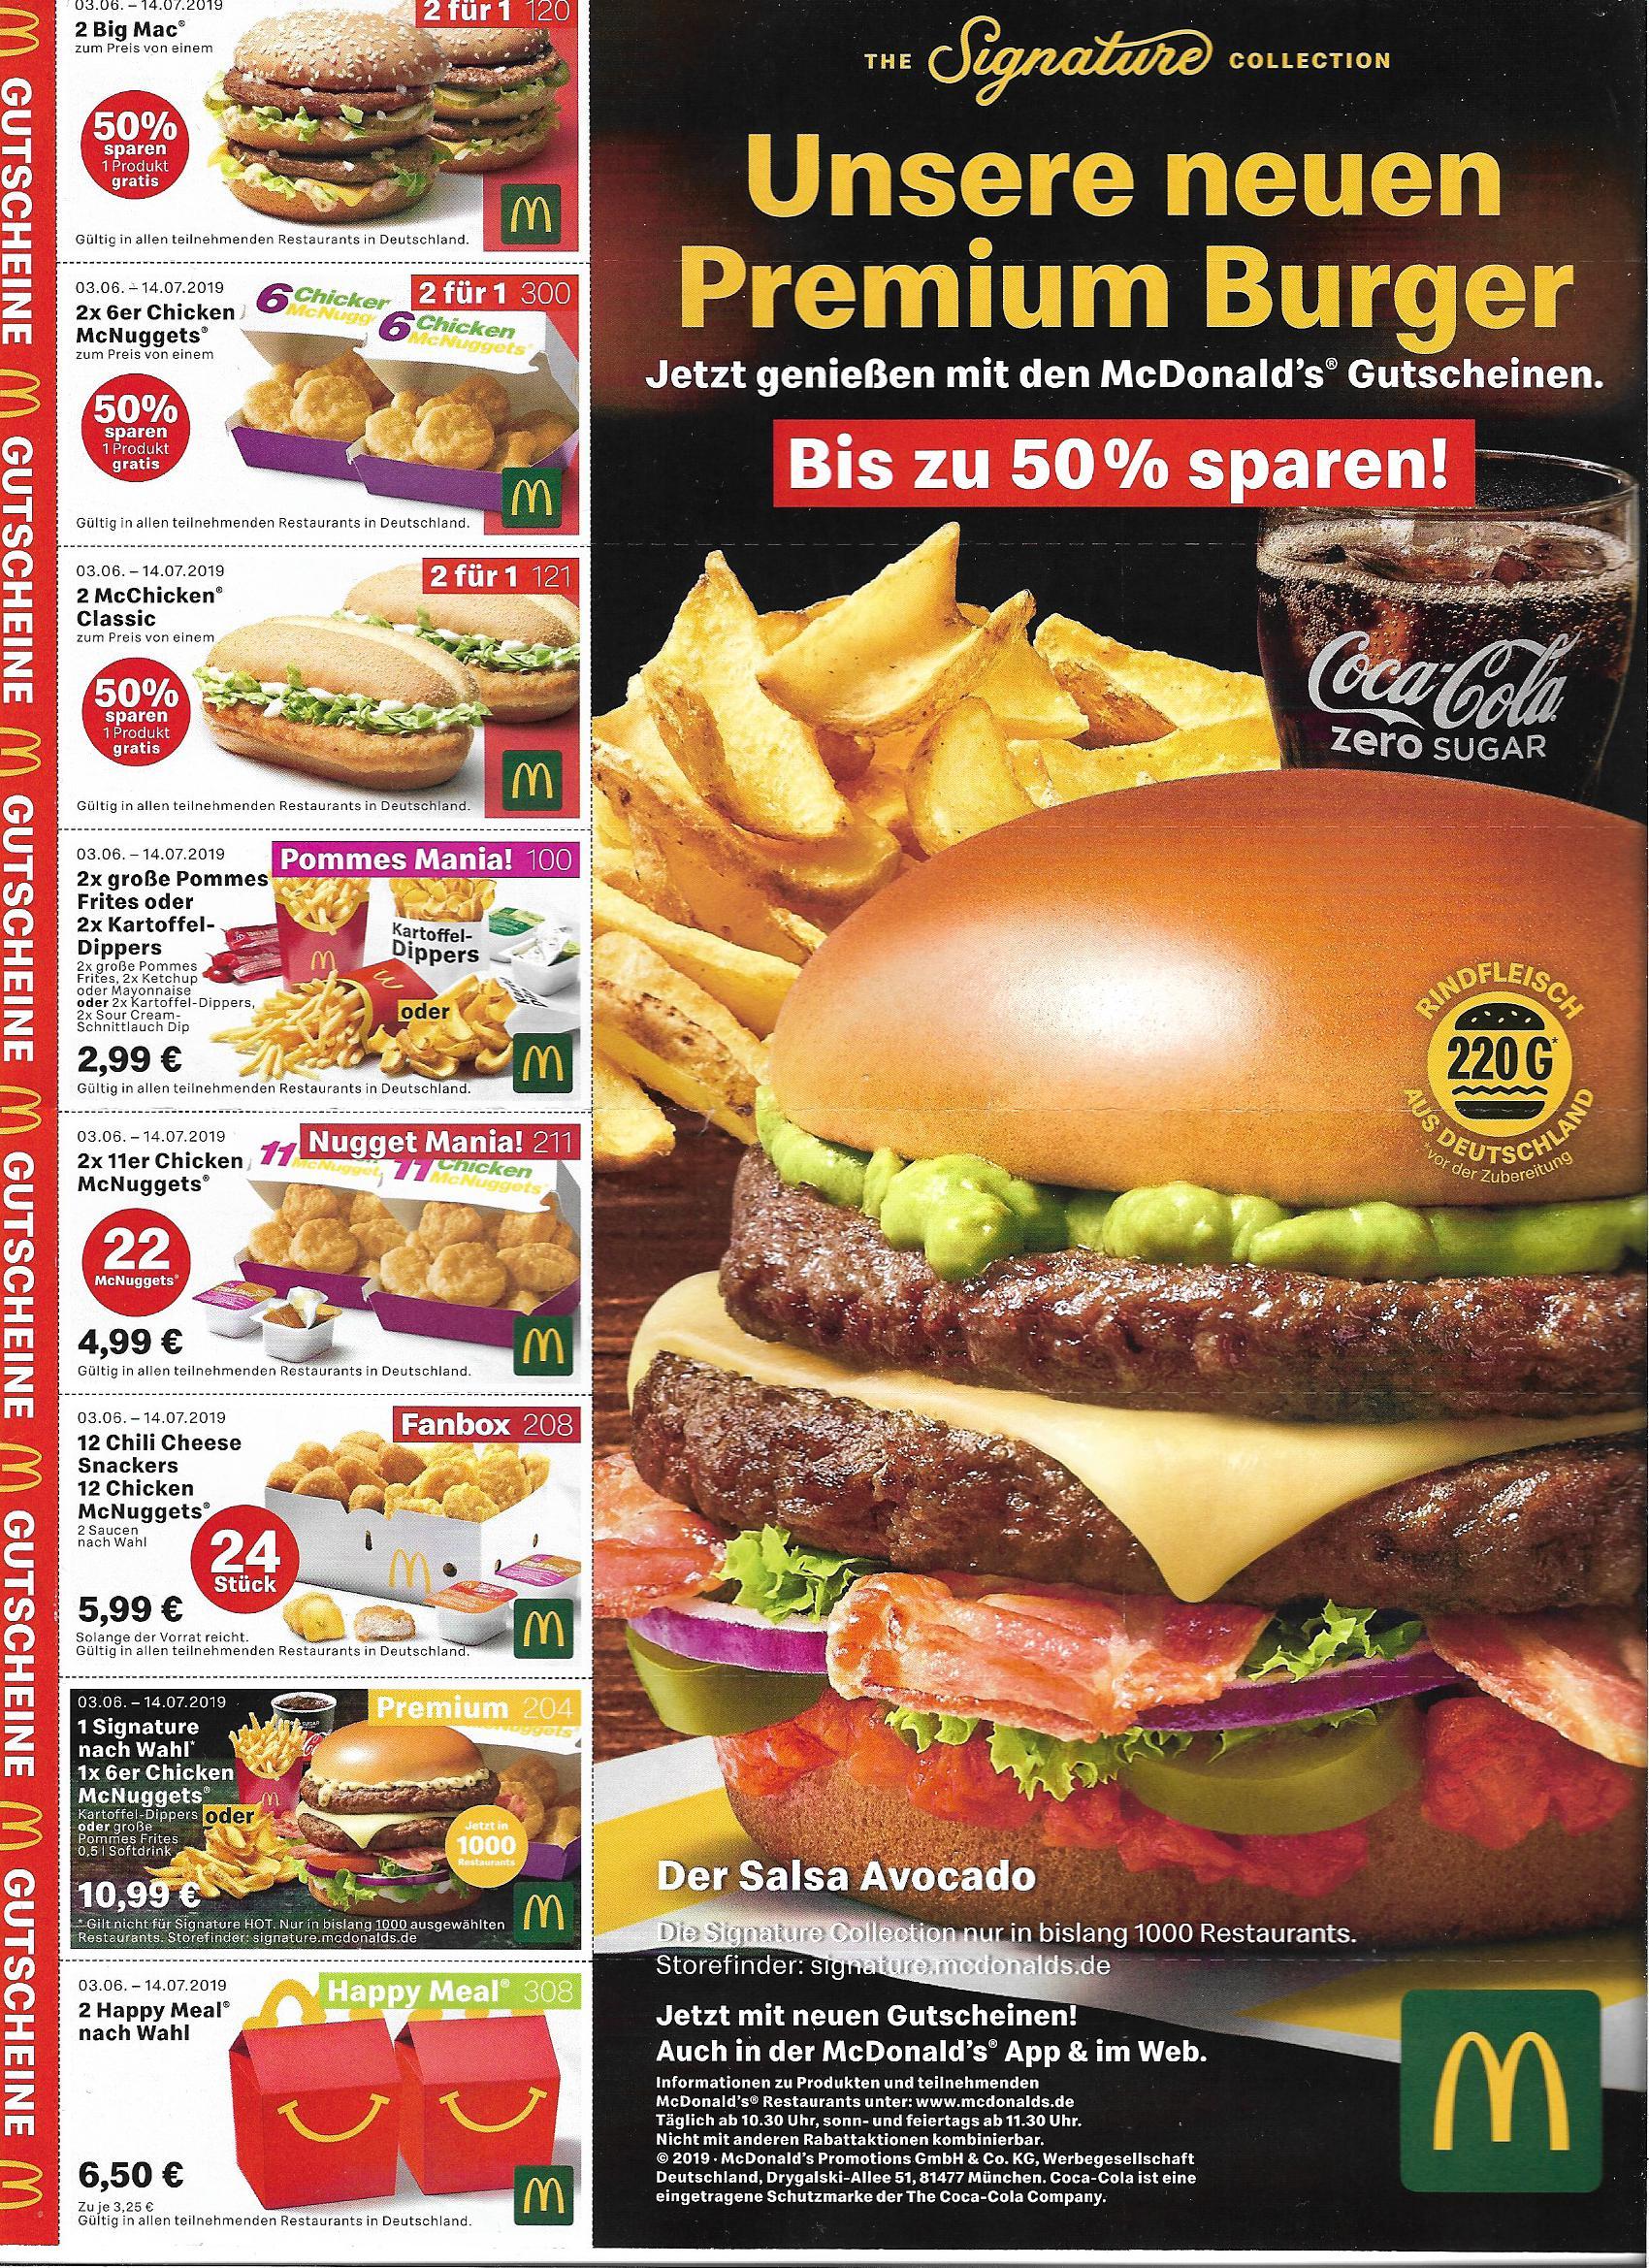 [McDonald's] Gutscheine/Coupons ab 03.06.219 - 14.07.2019